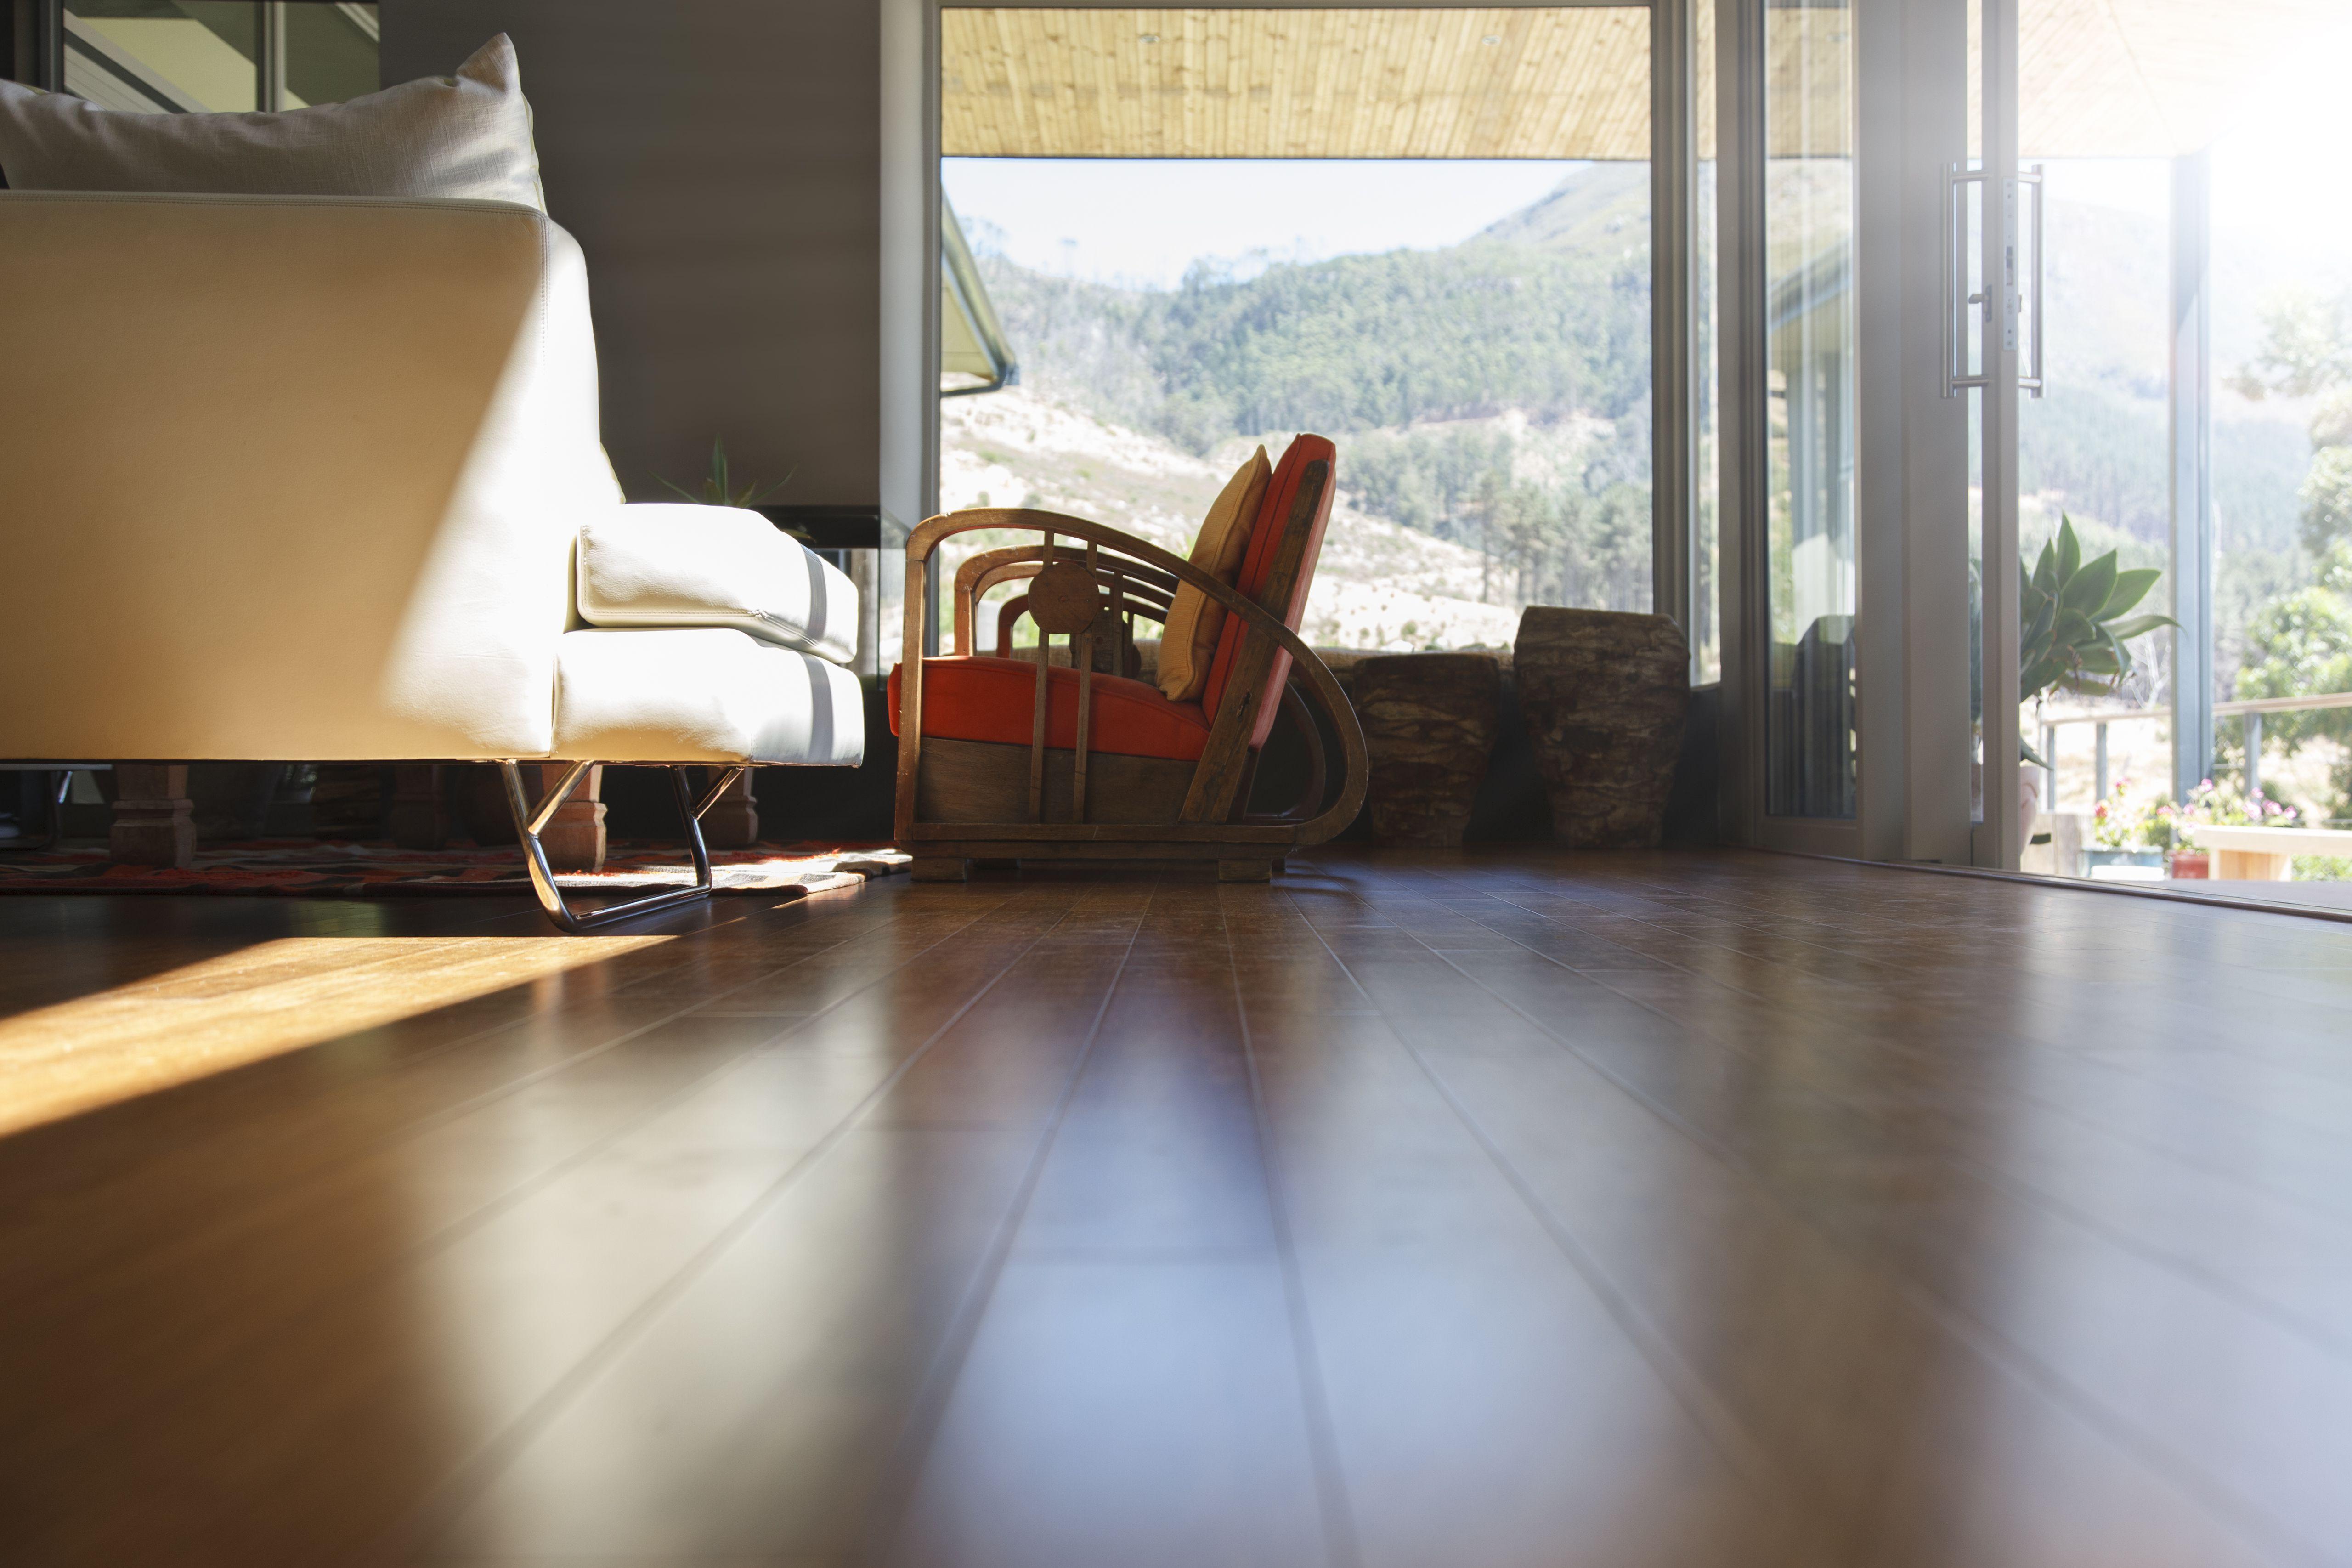 hand scraped hardwood vs engineered flooring of types of engineered flooring from premium hardwoods for living room interior hard wood floor and sofa 525439899 5a764f241d64040037603c15